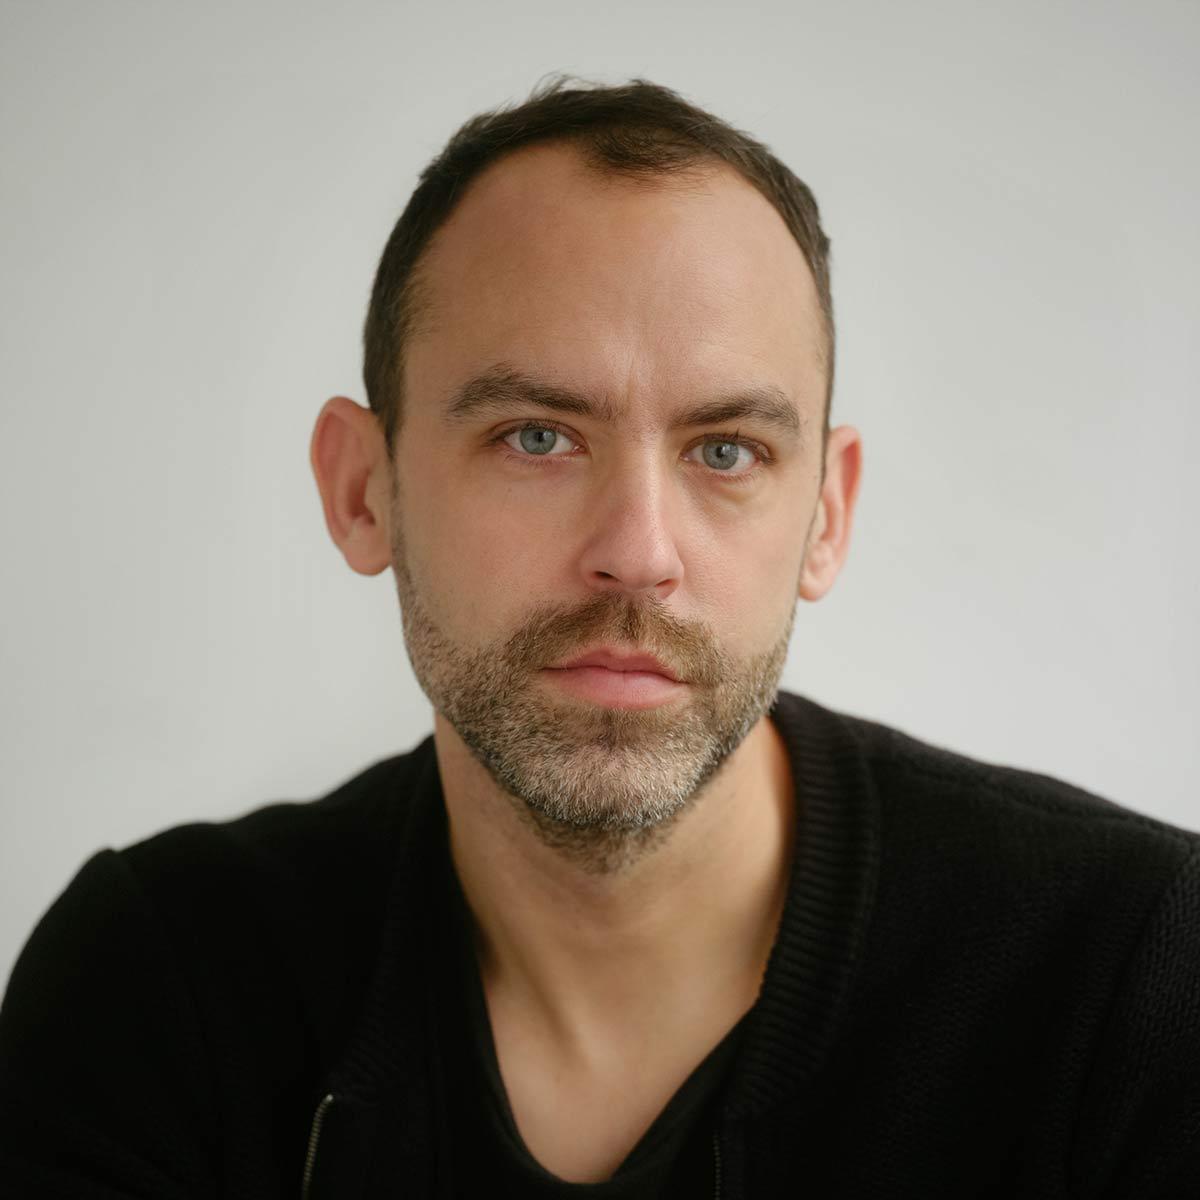 Micheal Beaulieu is a Webflow Developer  from Montreal, QC.